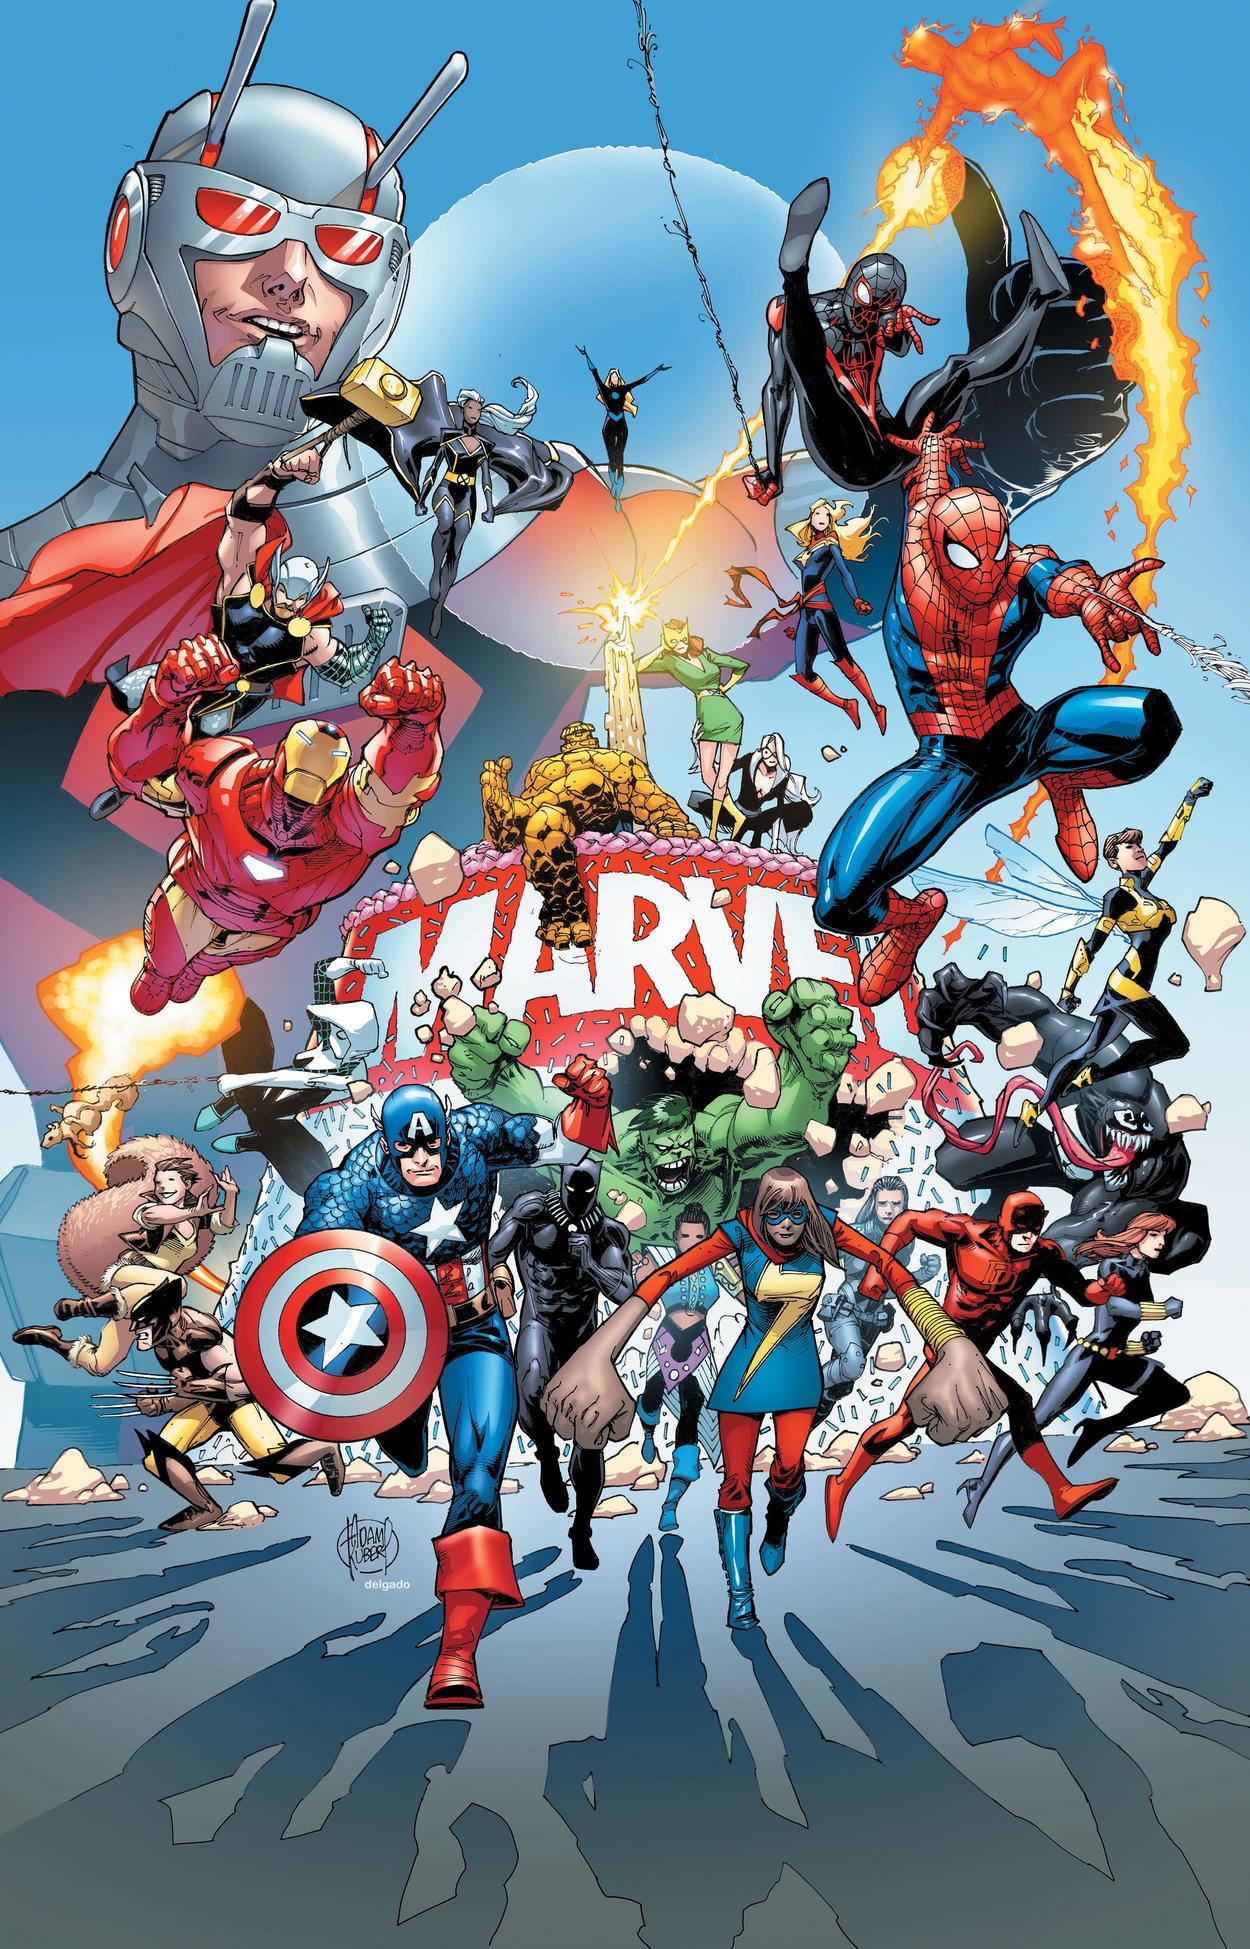 Arte del 80º. Aniversario de Marvel por Adam Kubert. Imagen: Marvel.com